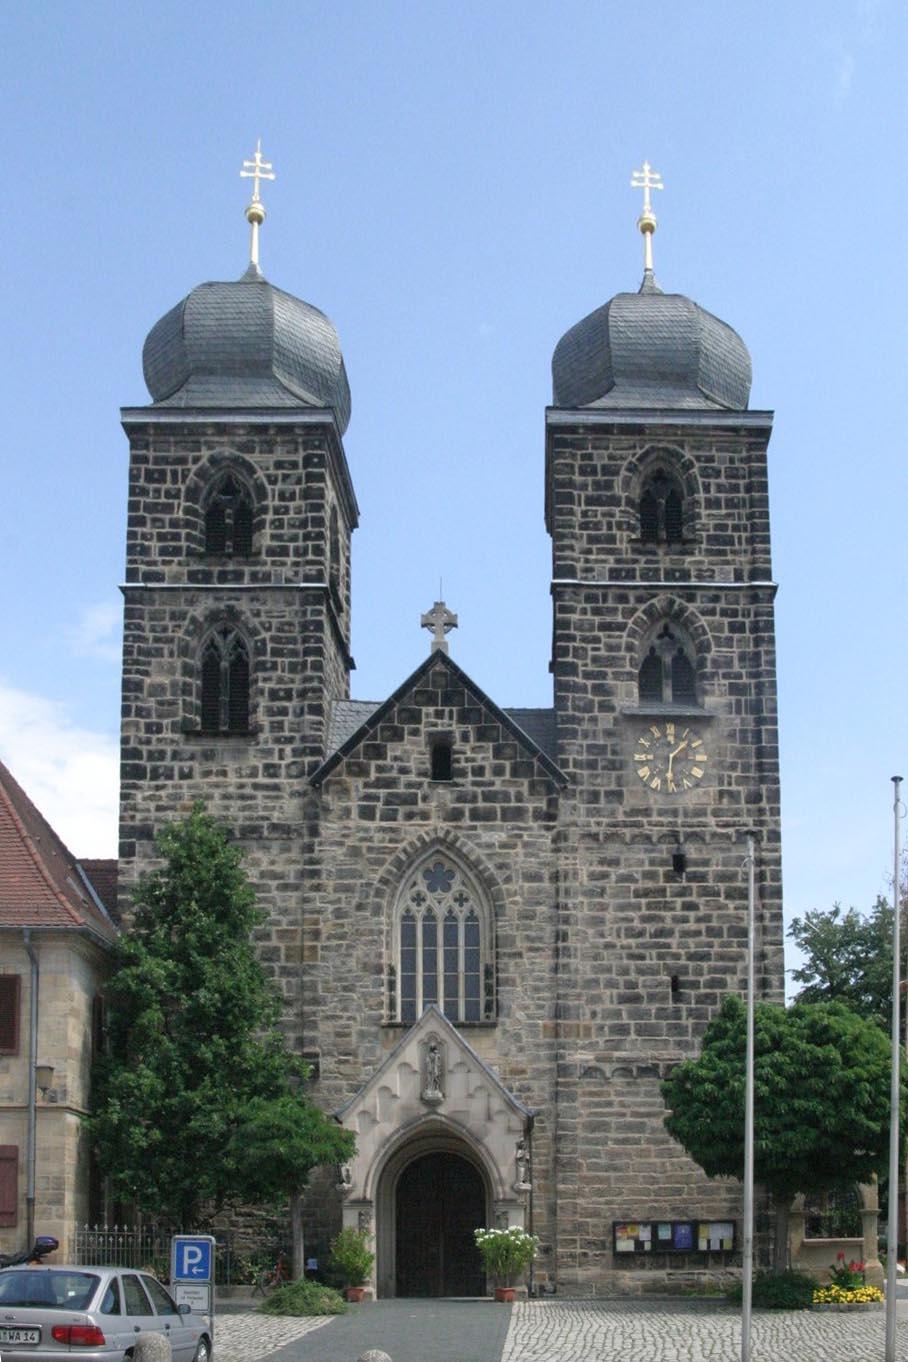 Pfarrkirche St. Gangolf in Bamberg